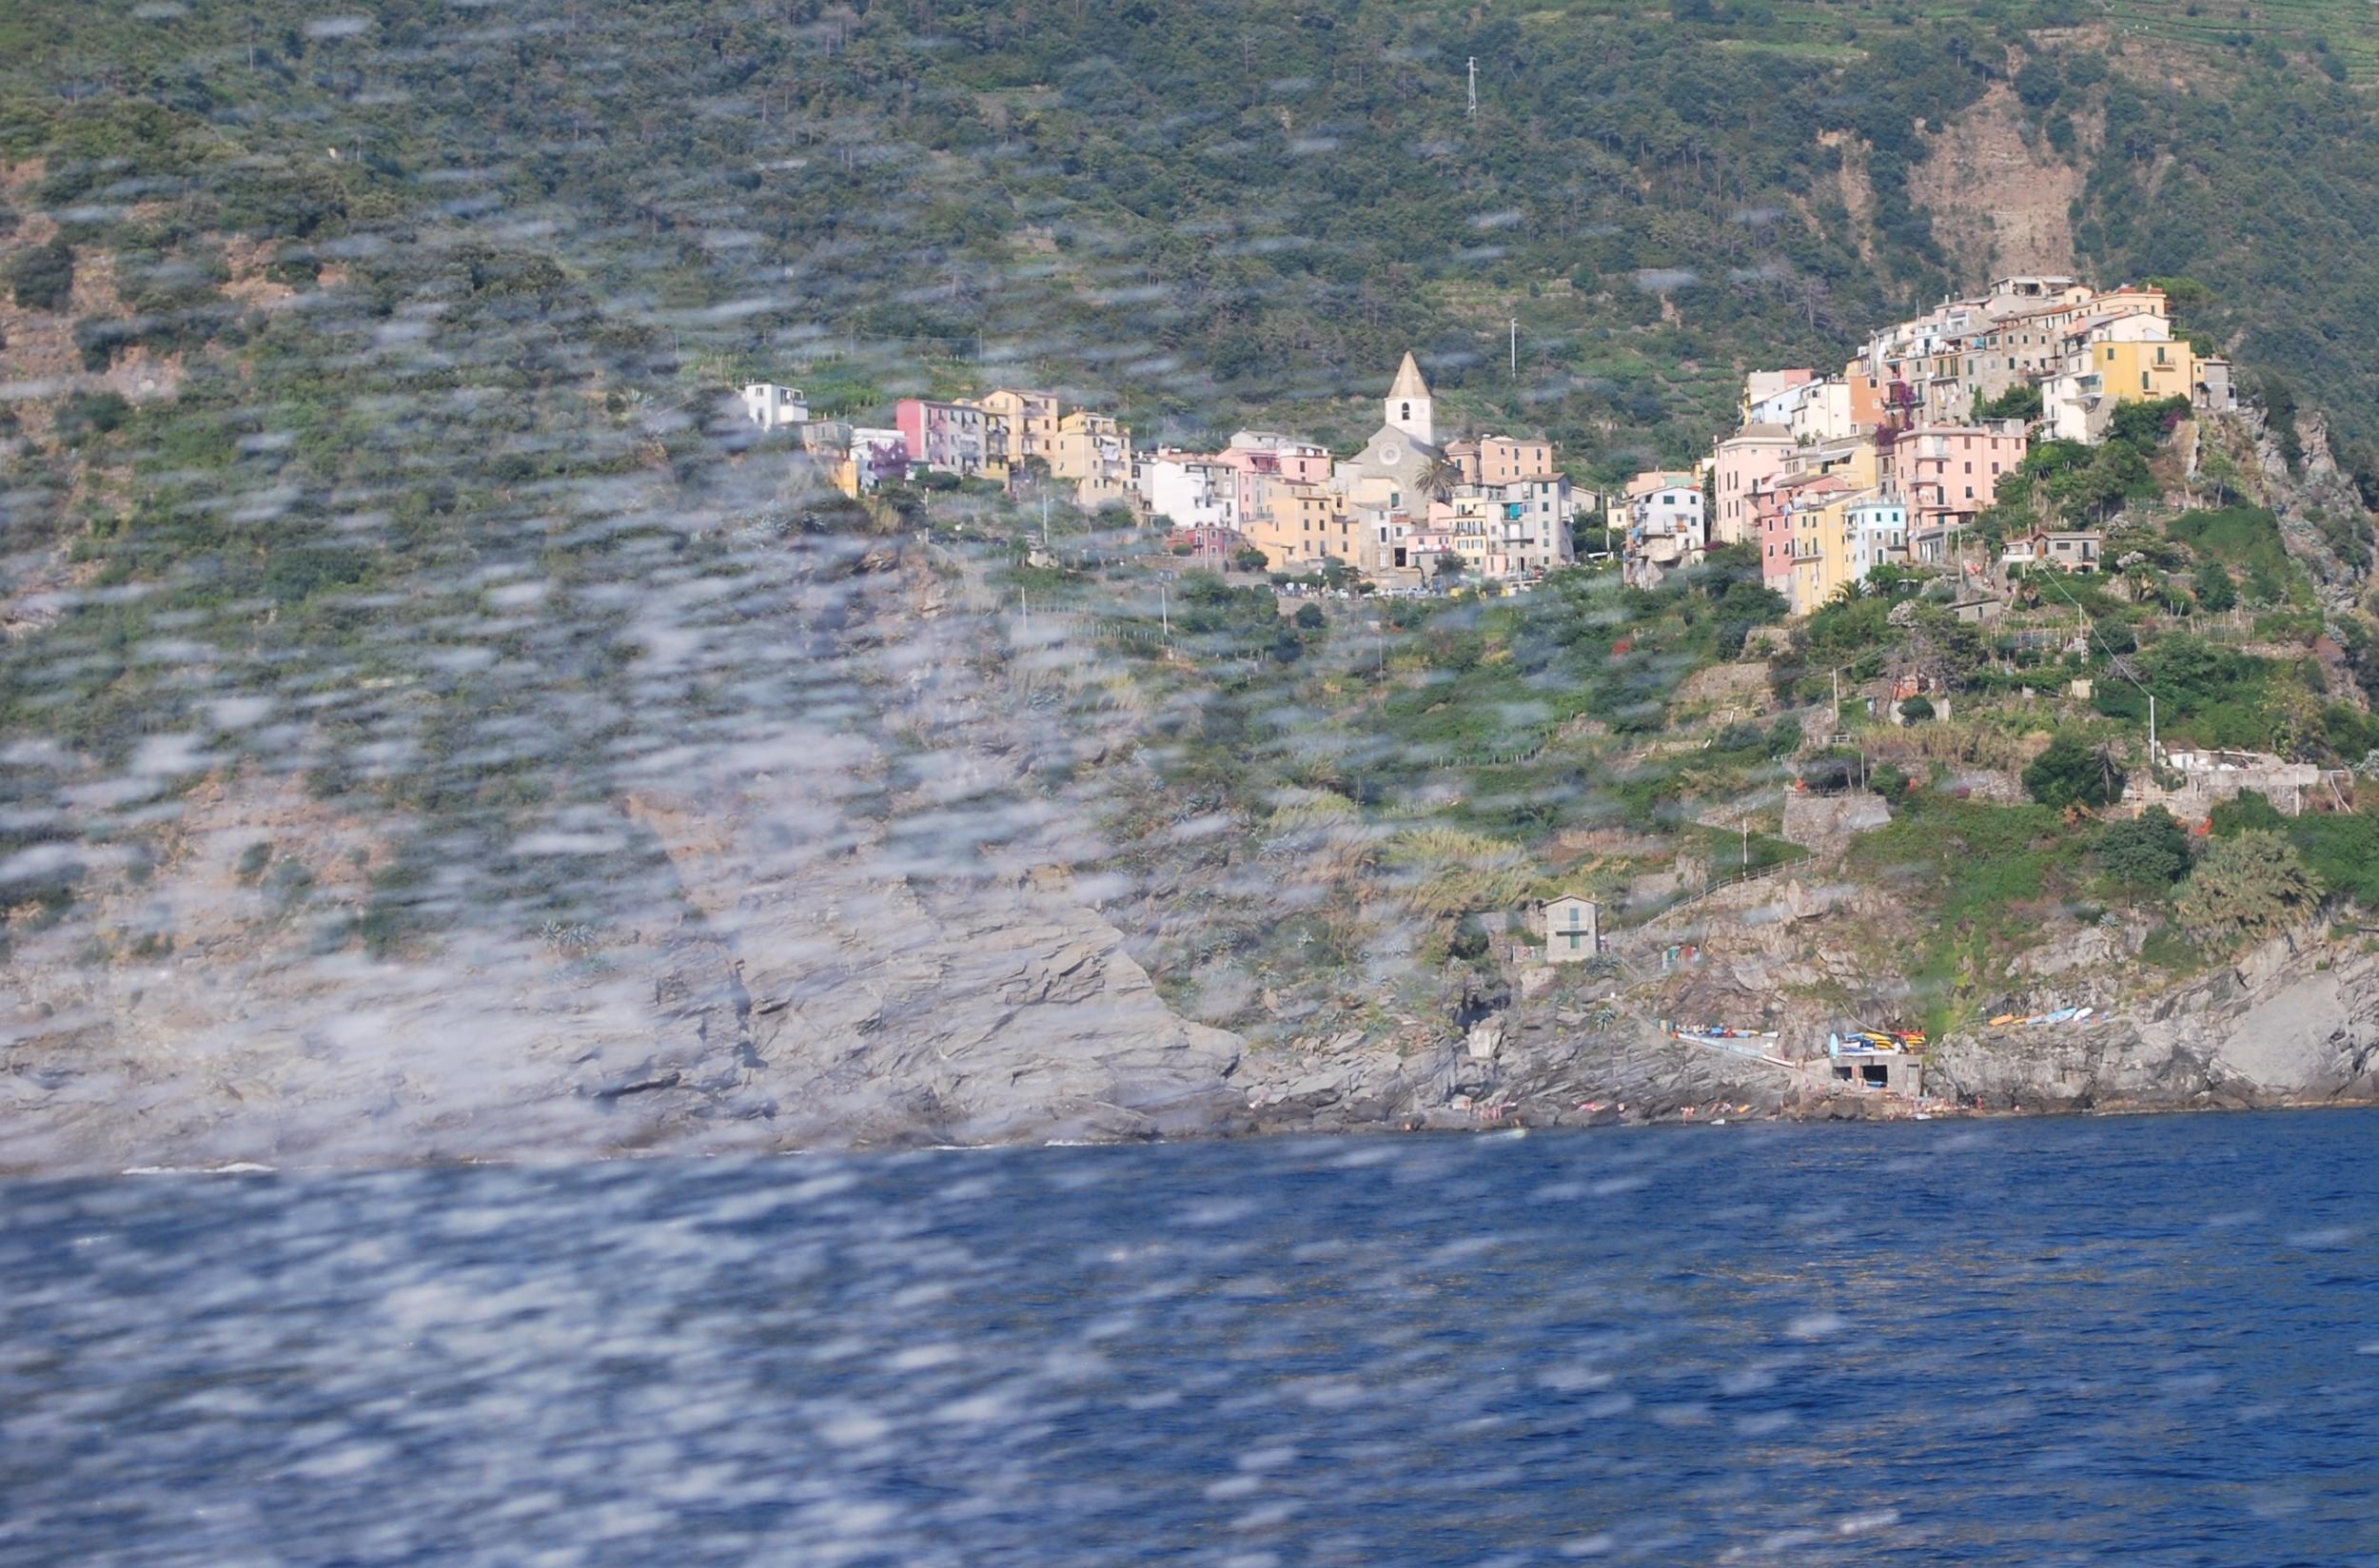 17 July 2014, Jigsaw Cinque Terre